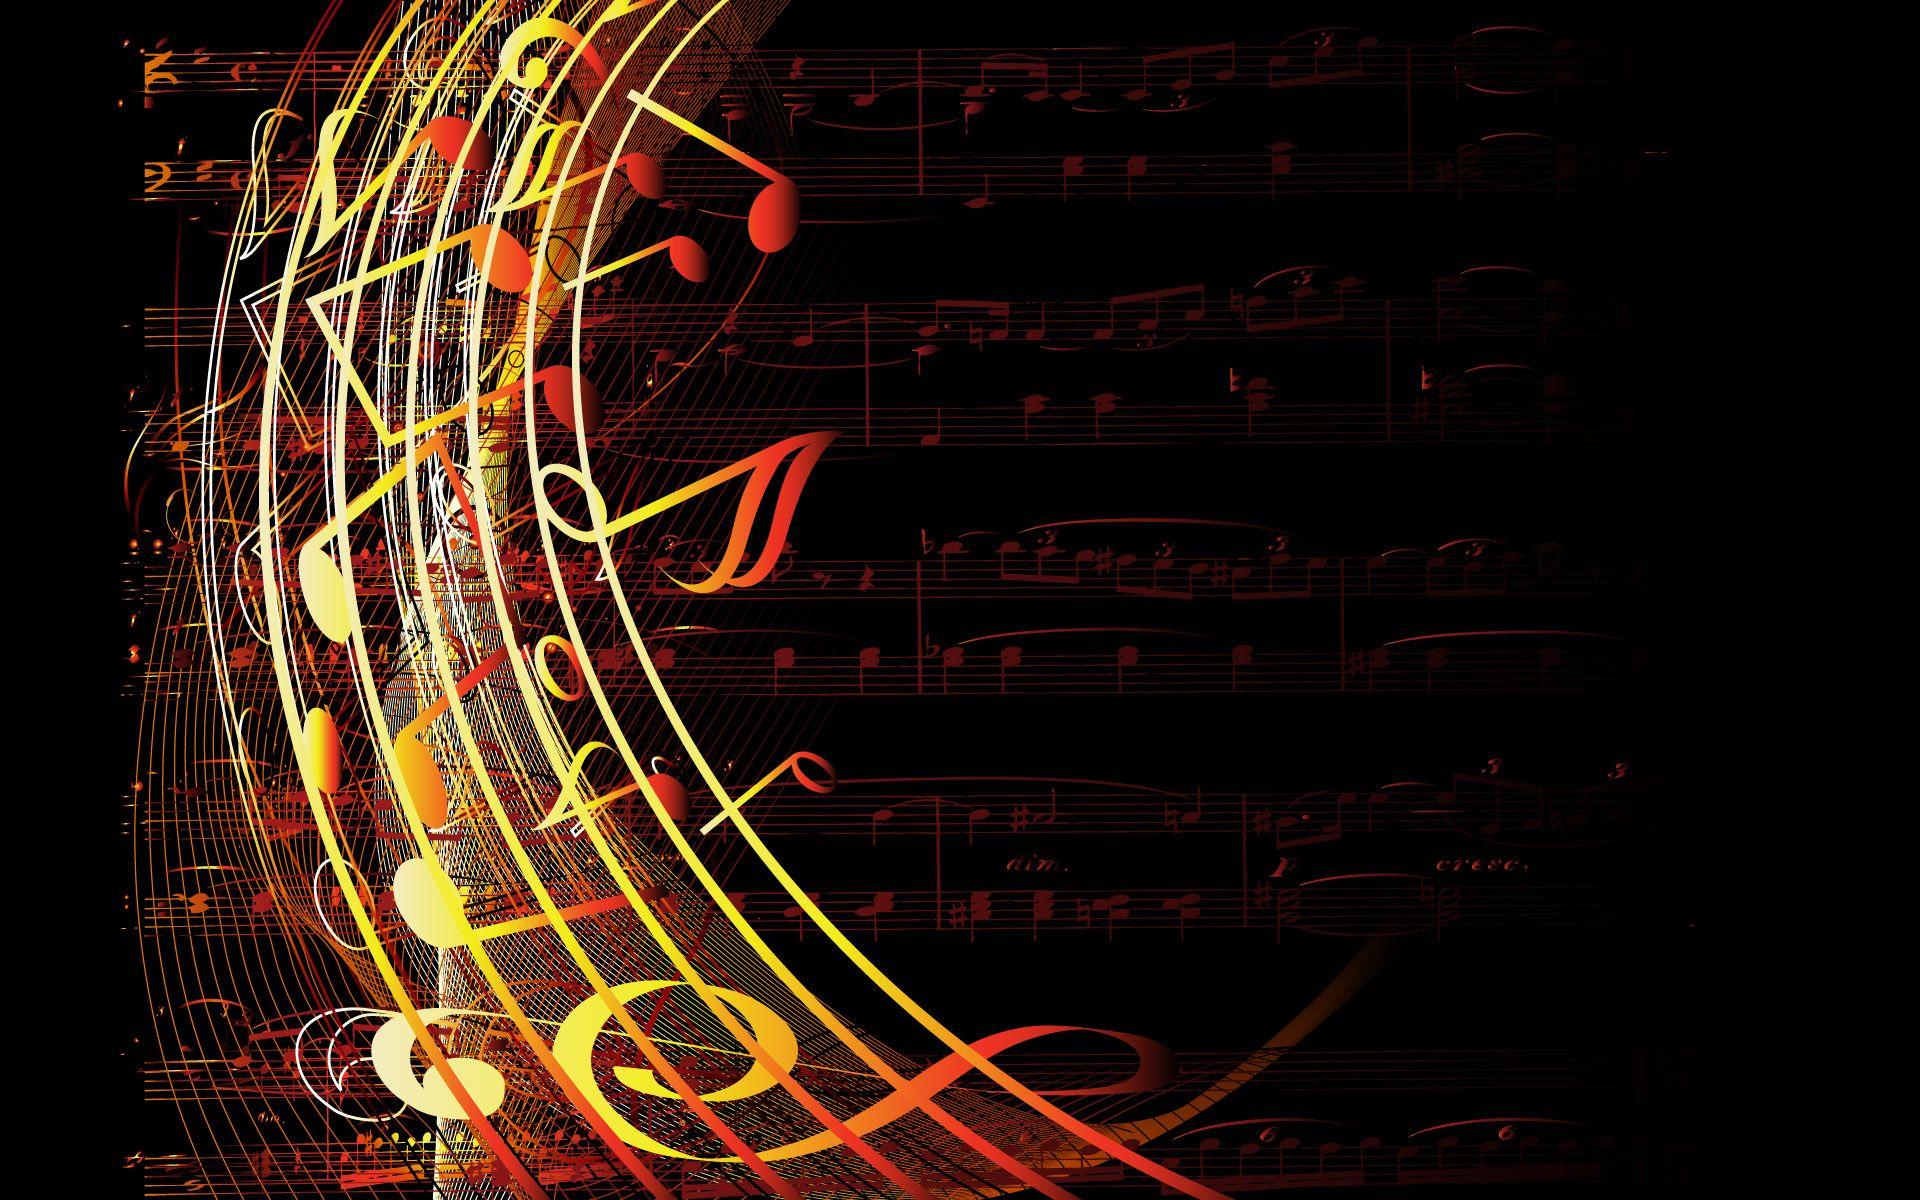 Top Wallpaper High Resolution Music - d75a9cb0a9db06ff12695778981aa191  Pic_942864.jpg